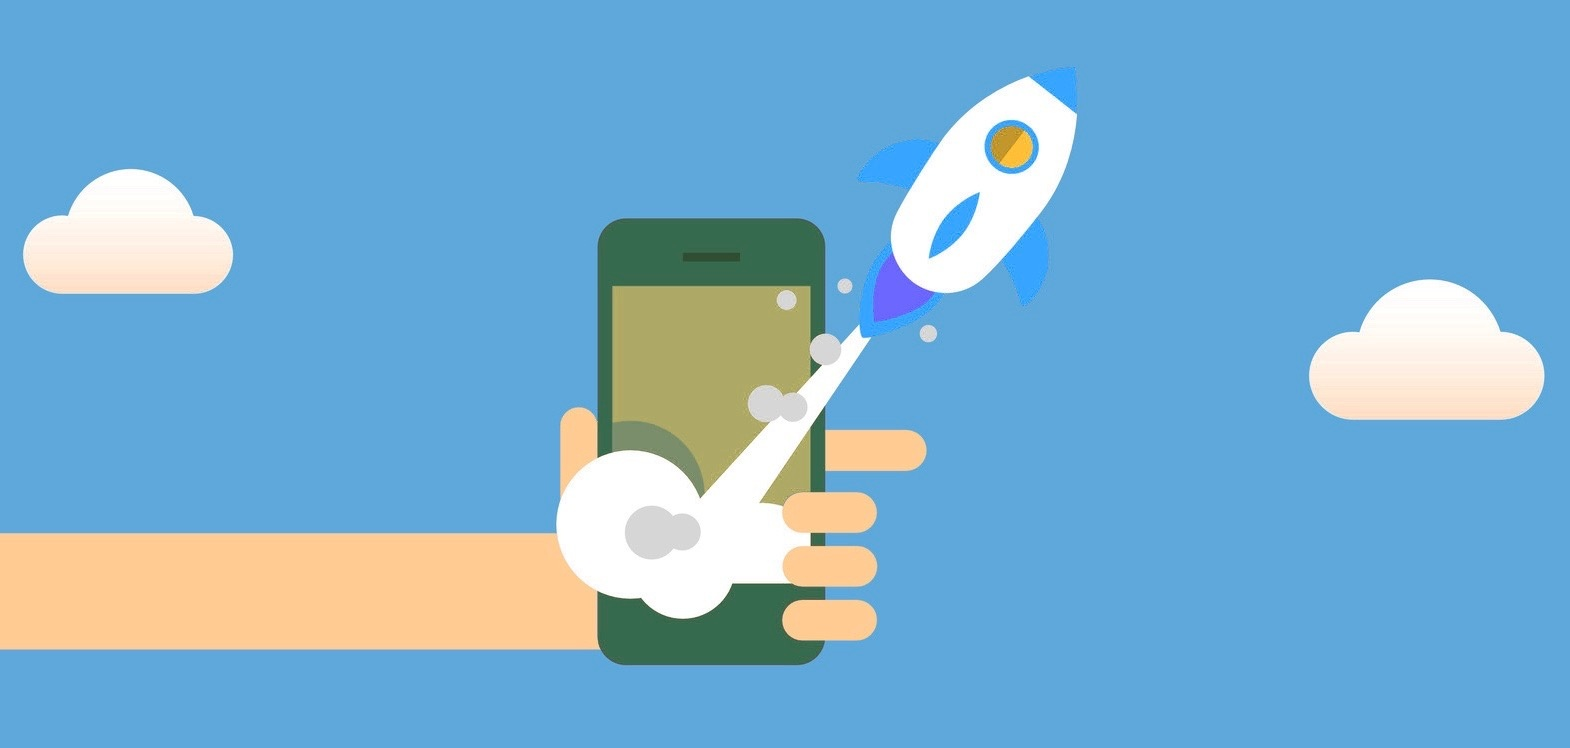 rakete-startet-smartphone-handy-app